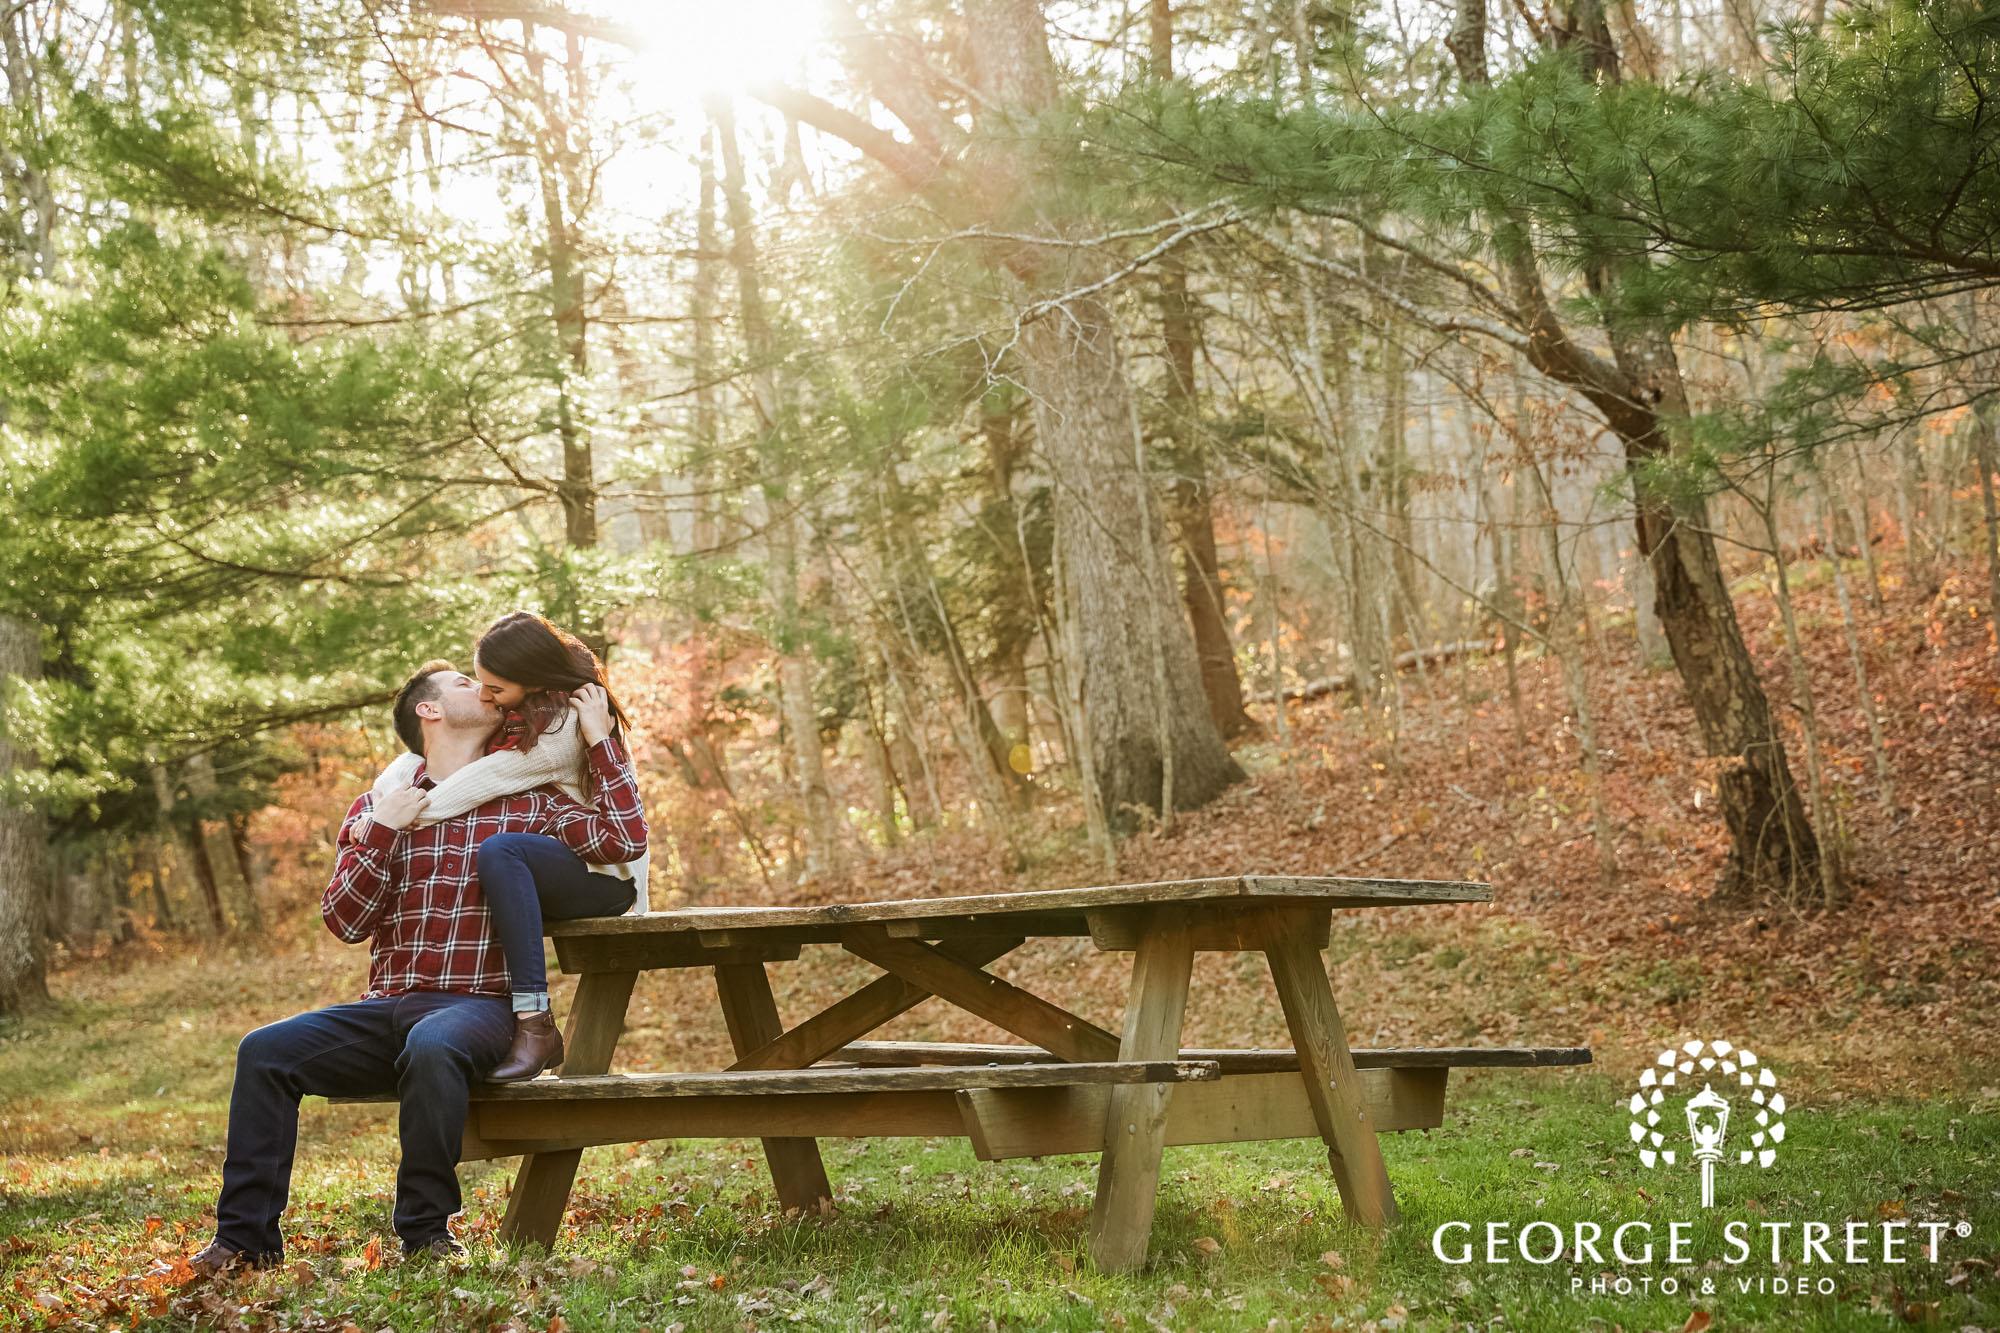 adorable couple on bench at devils hopyard state park in hartford